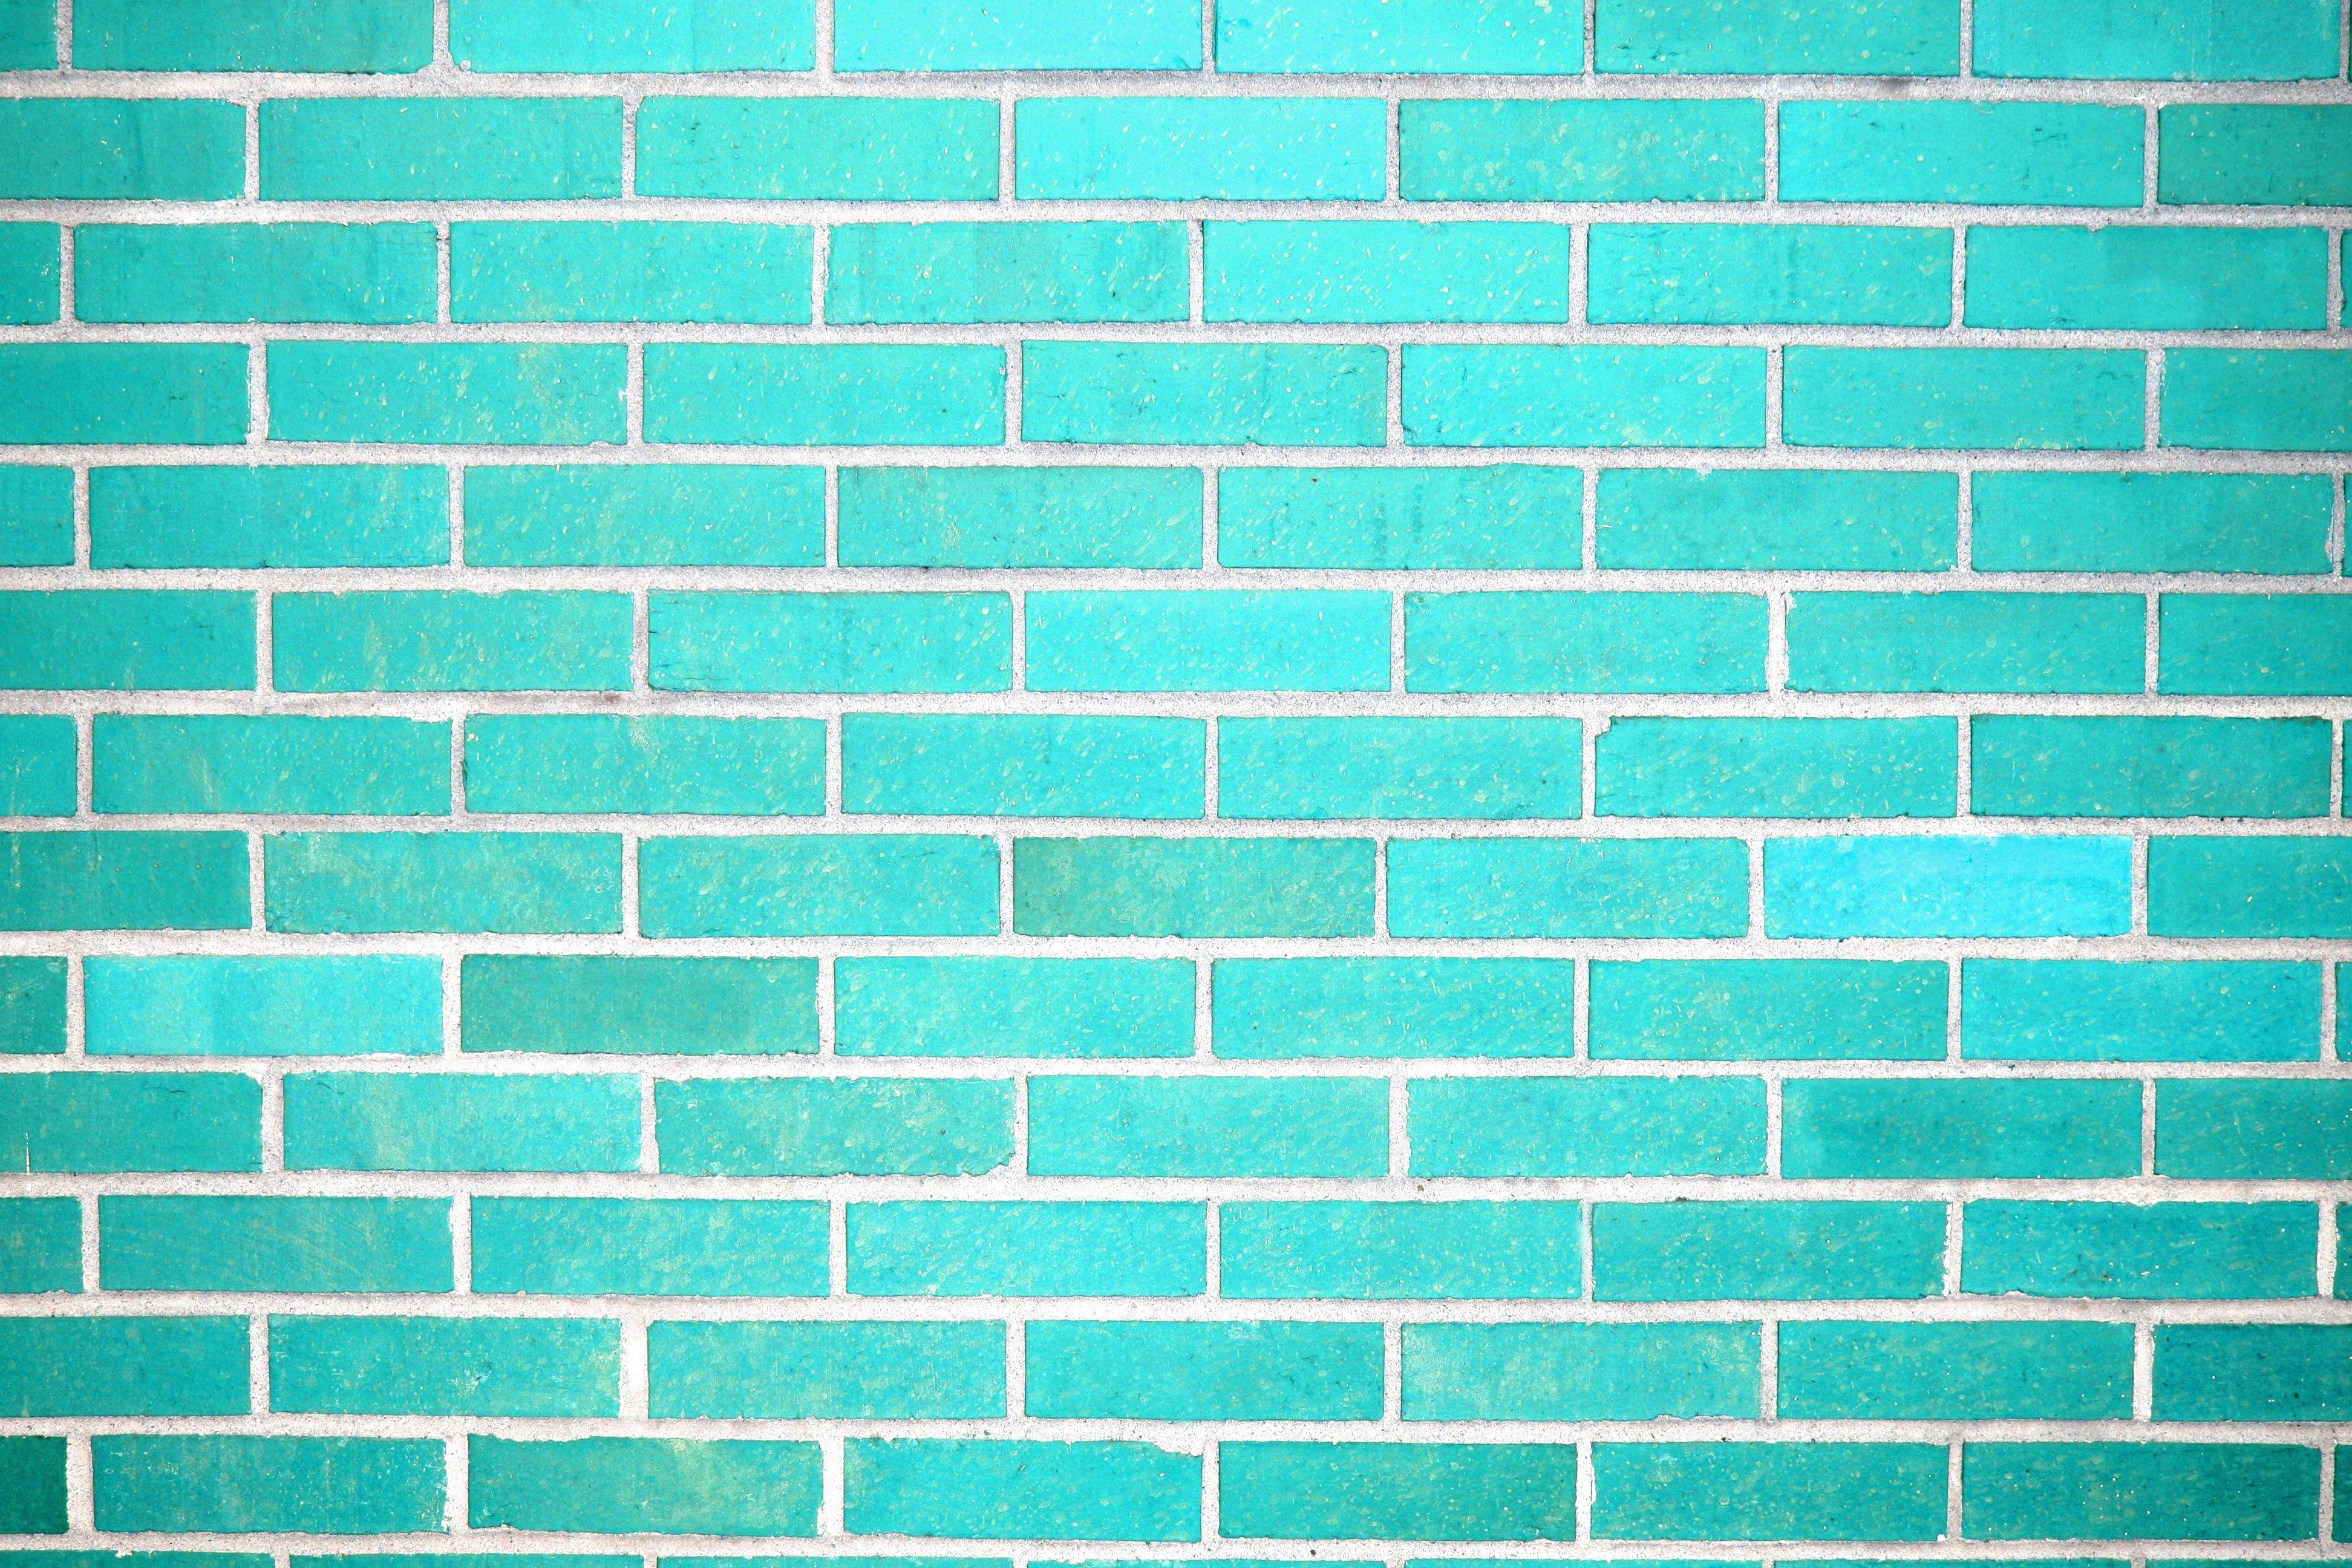 Teal brick wall 3888 2592 cyan pinterest for Teal kitchen wallpaper